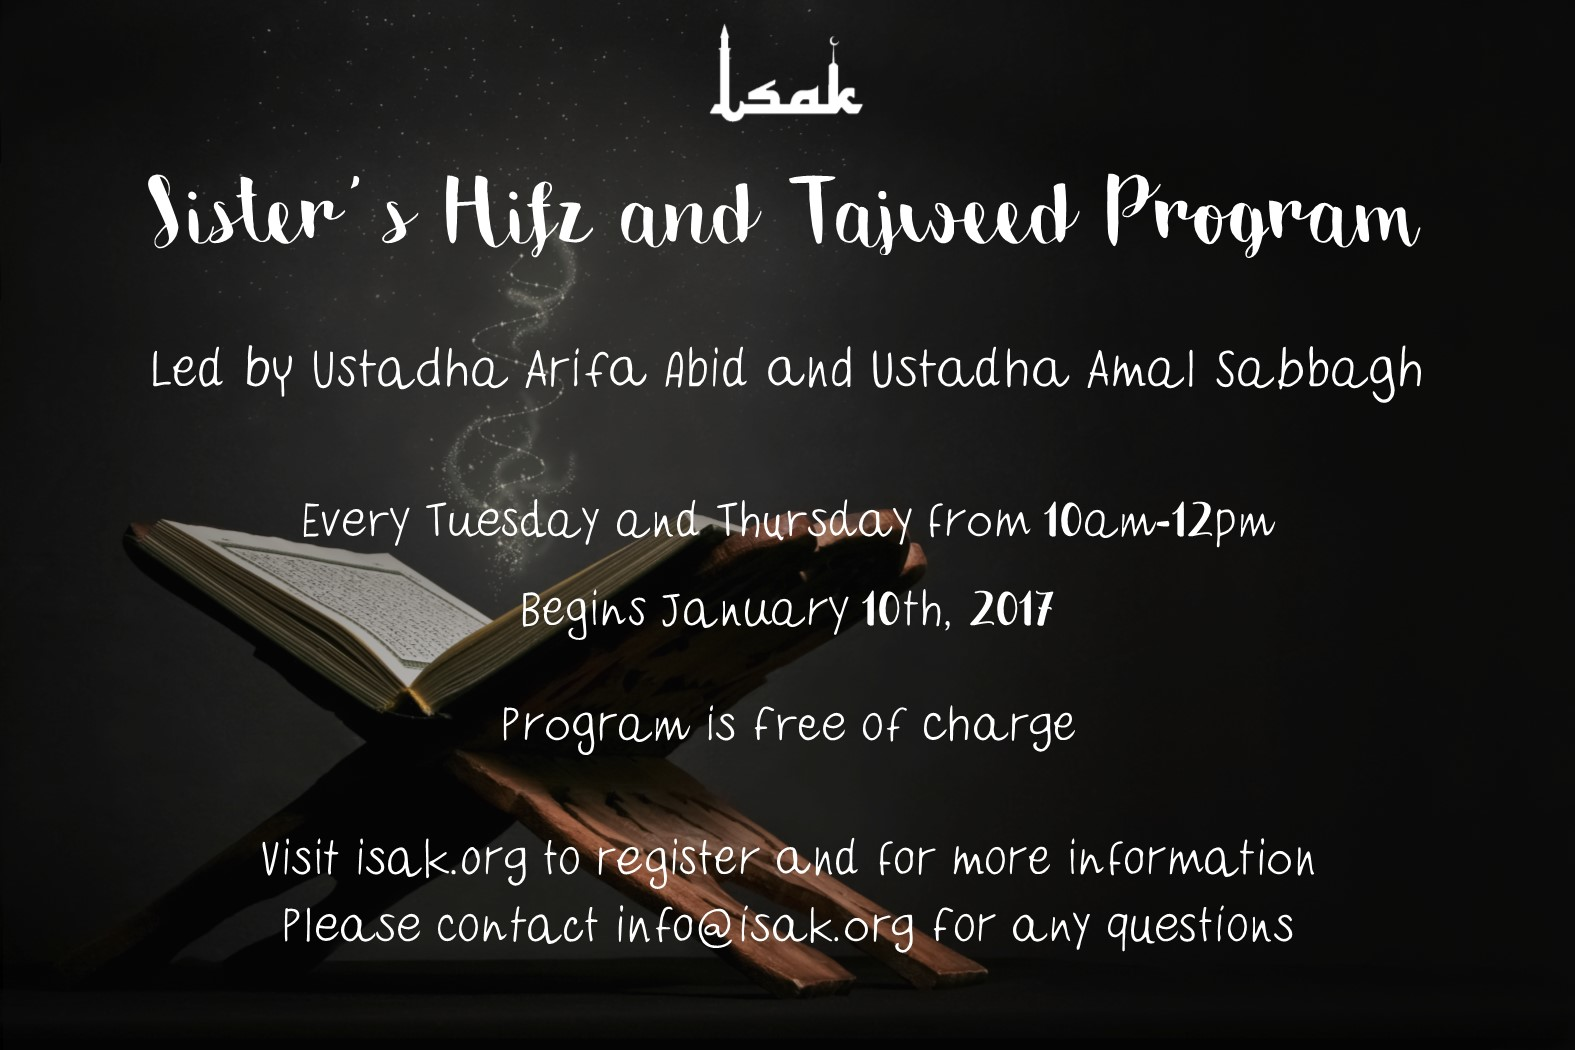 sisters-hifz-and-tajweed-program-1